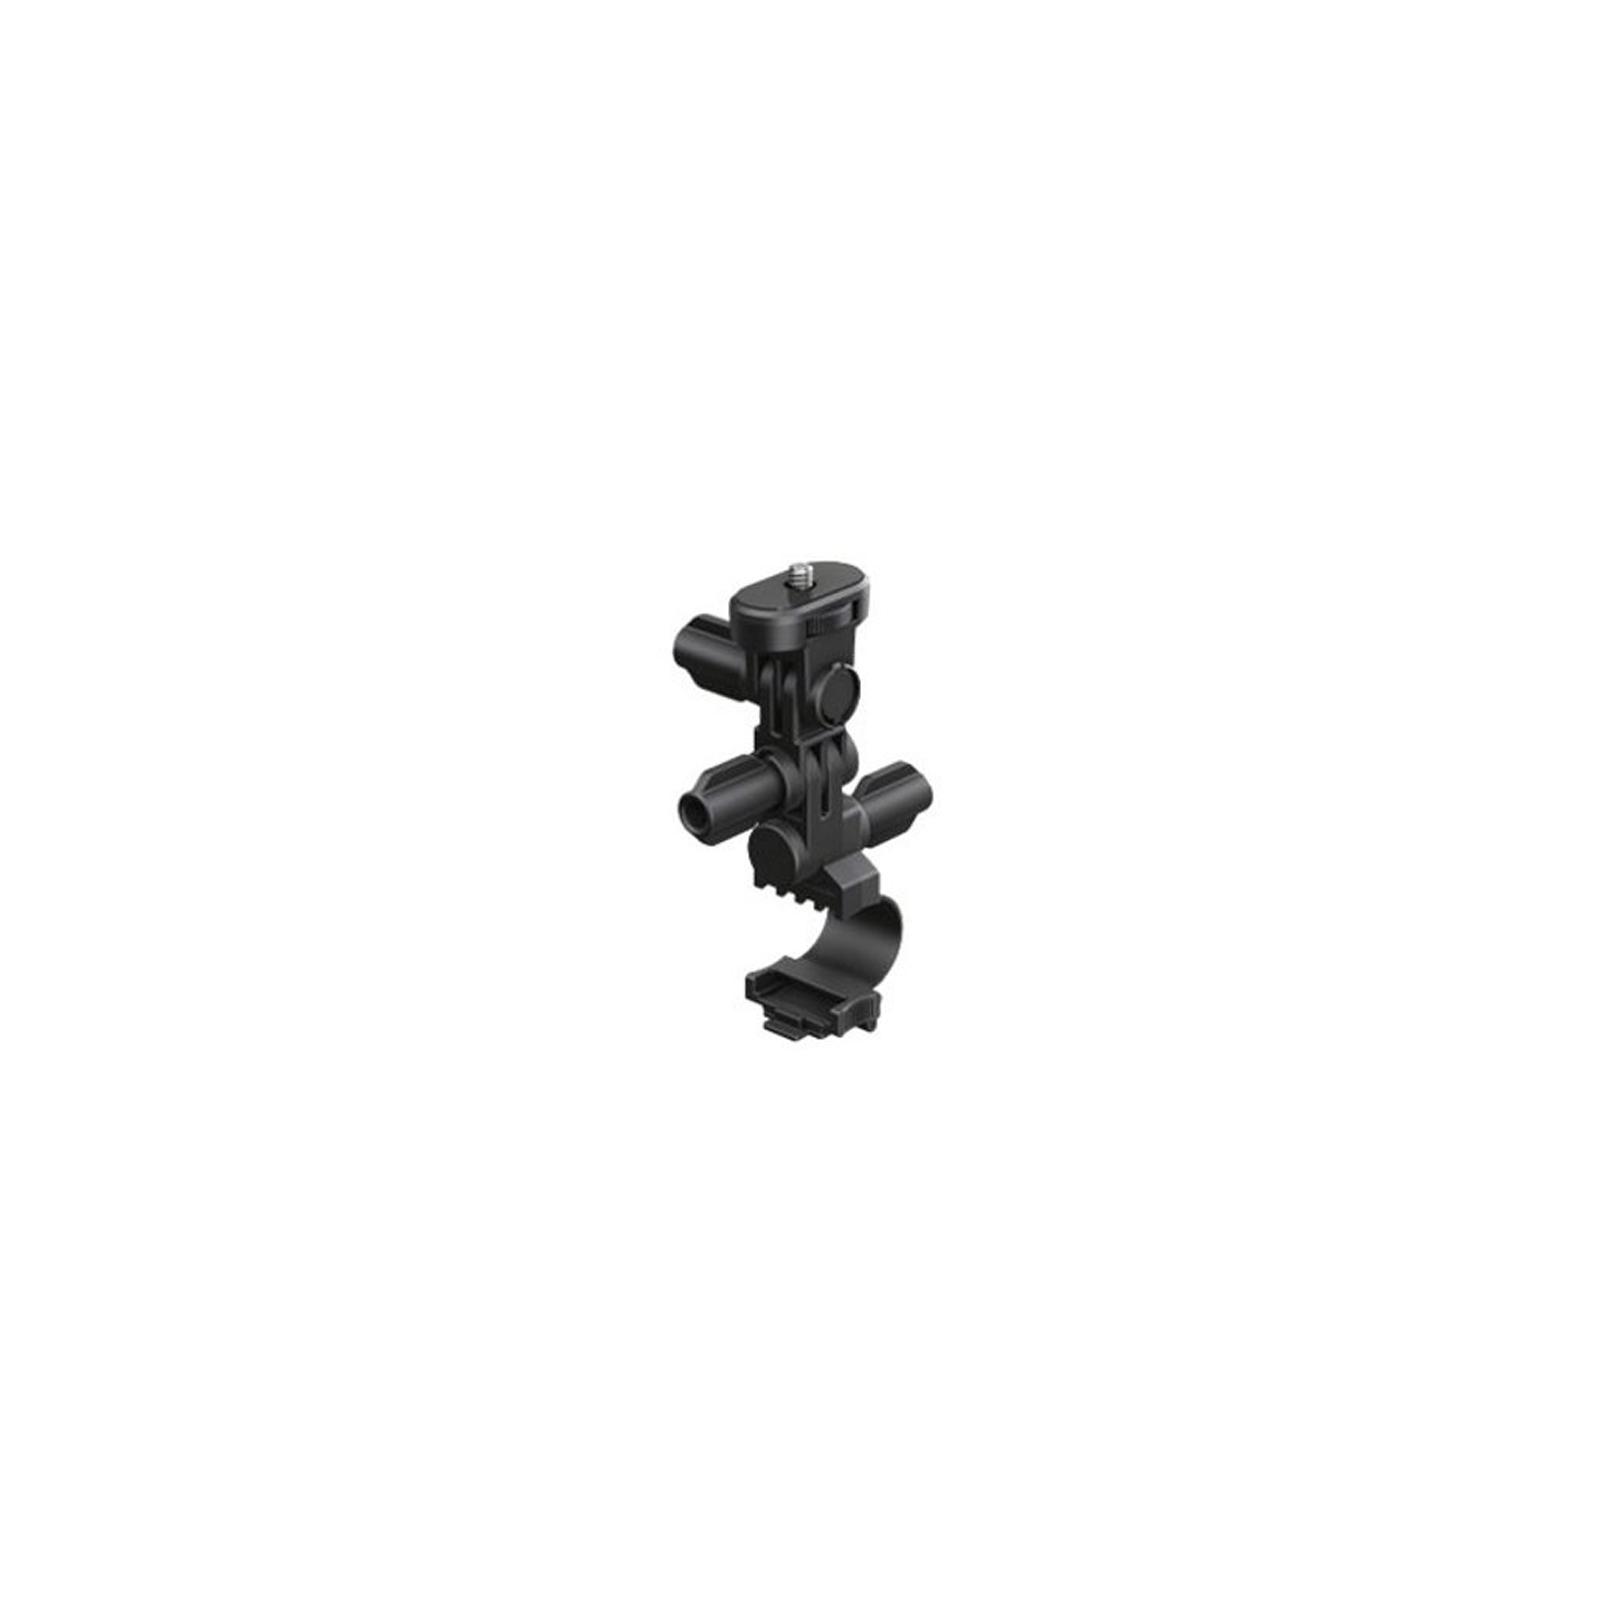 Экшн-камера SONY HDR-AS100V w/bicycle mount (HDRAS100VB.CEN) изображение 8